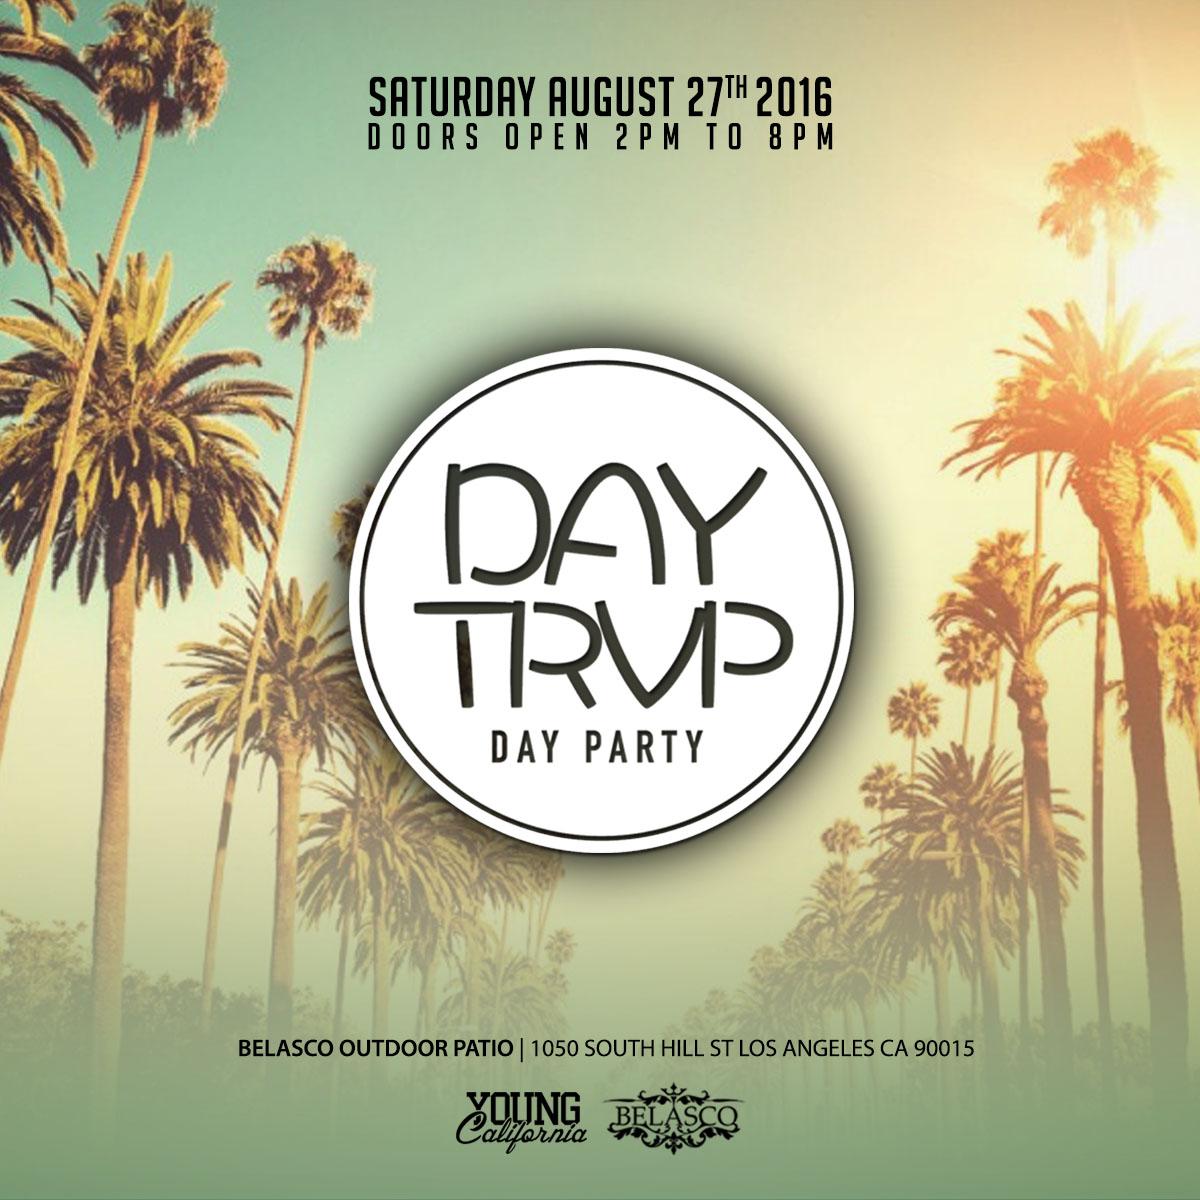 DayTrvp DayParty Tickets 08/27/16